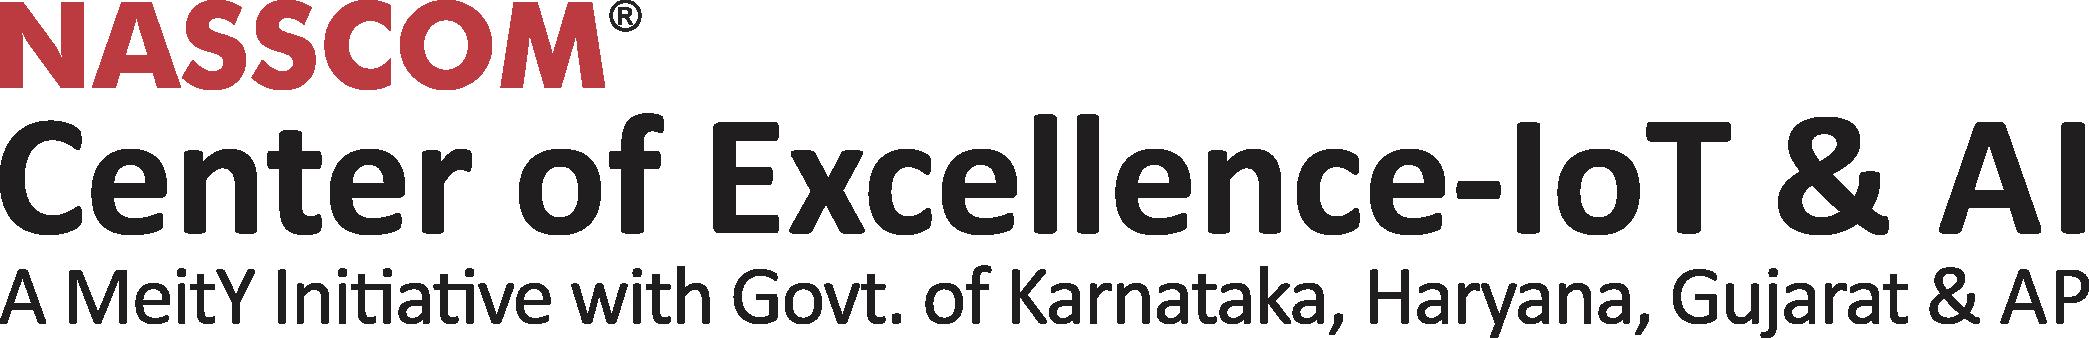 CoE logo (23rd July 2020)